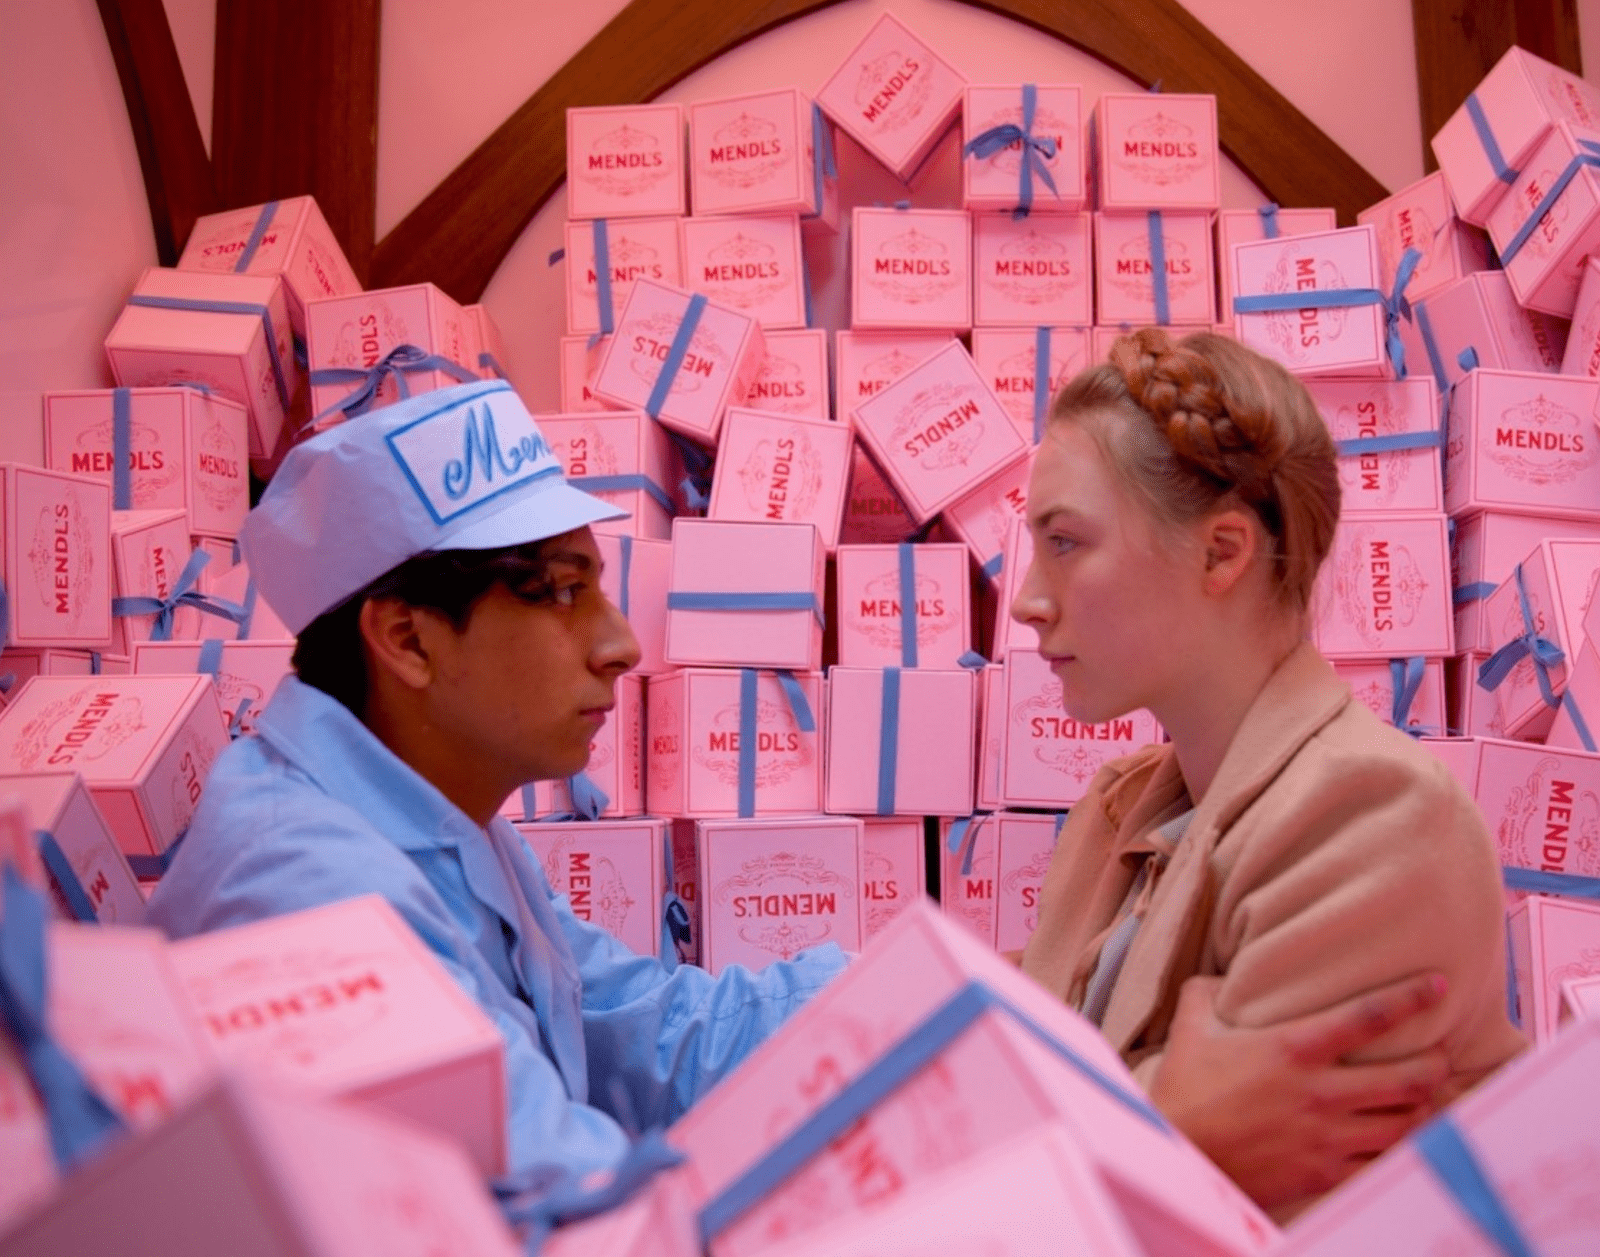 Valentine's Day the grand budapest hotel